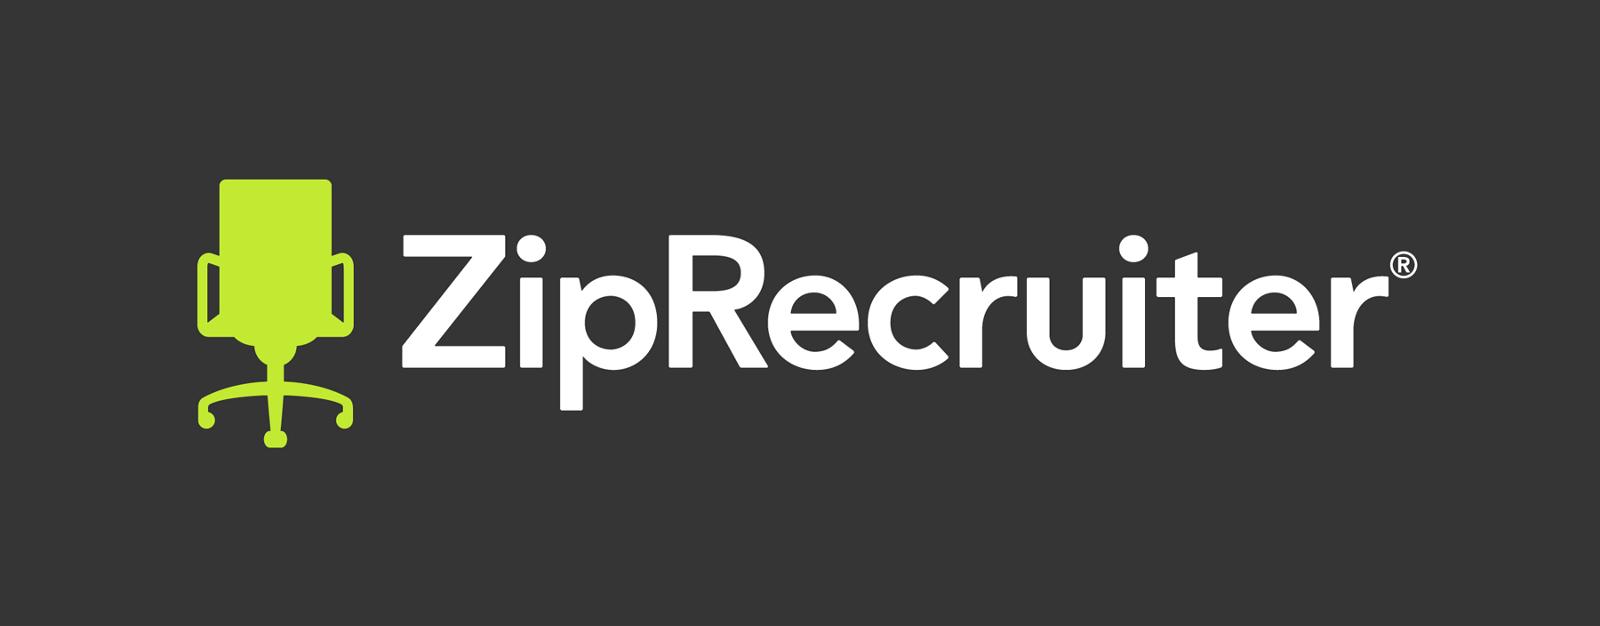 Ziprecruiter Logos.